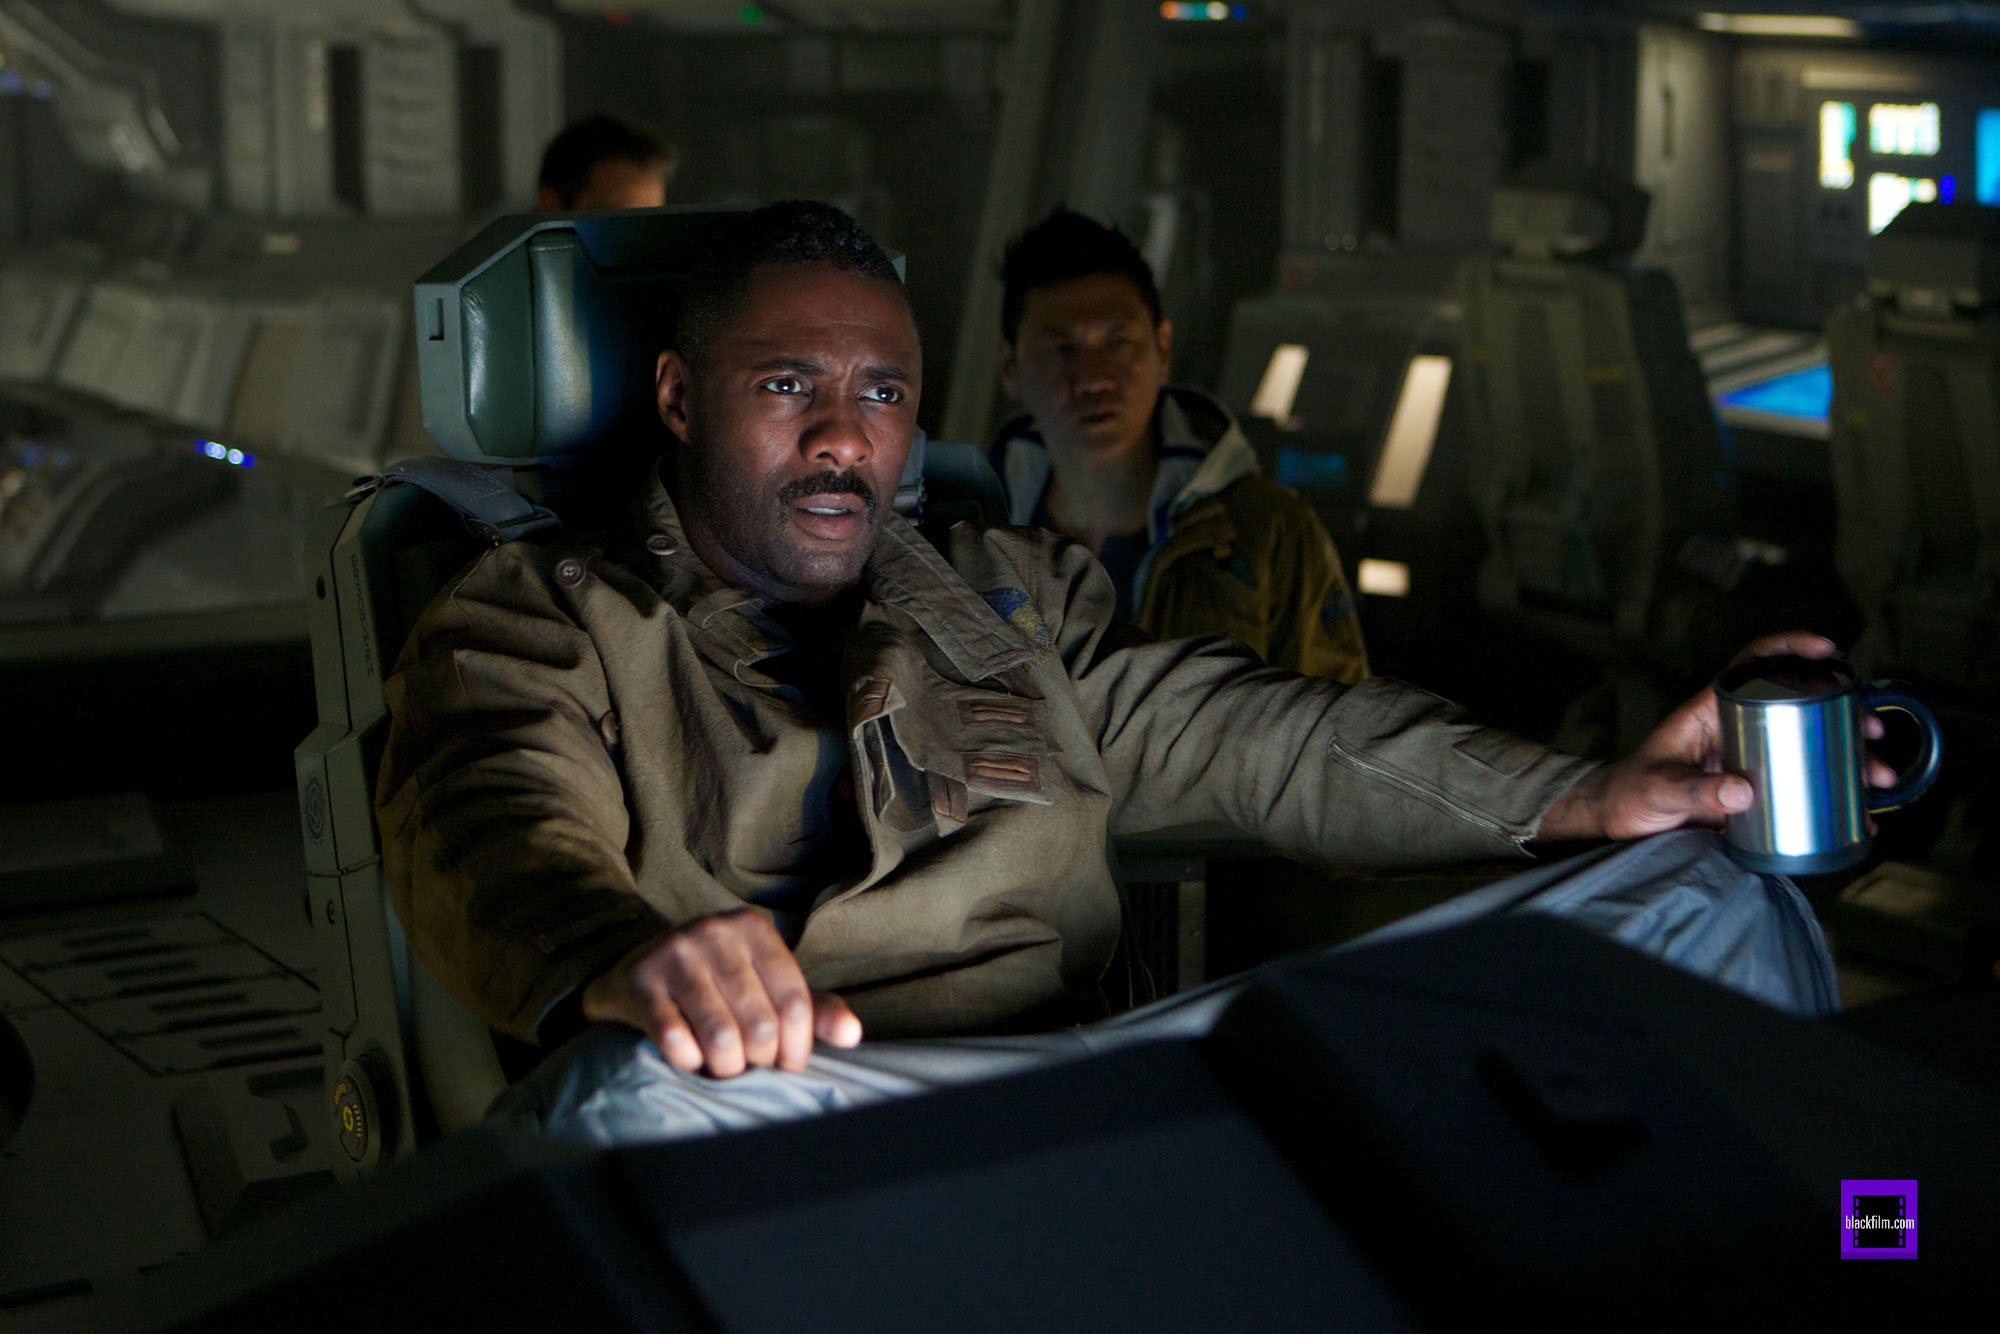 Looks like Idris Elba will be the villain of Star Trek 3